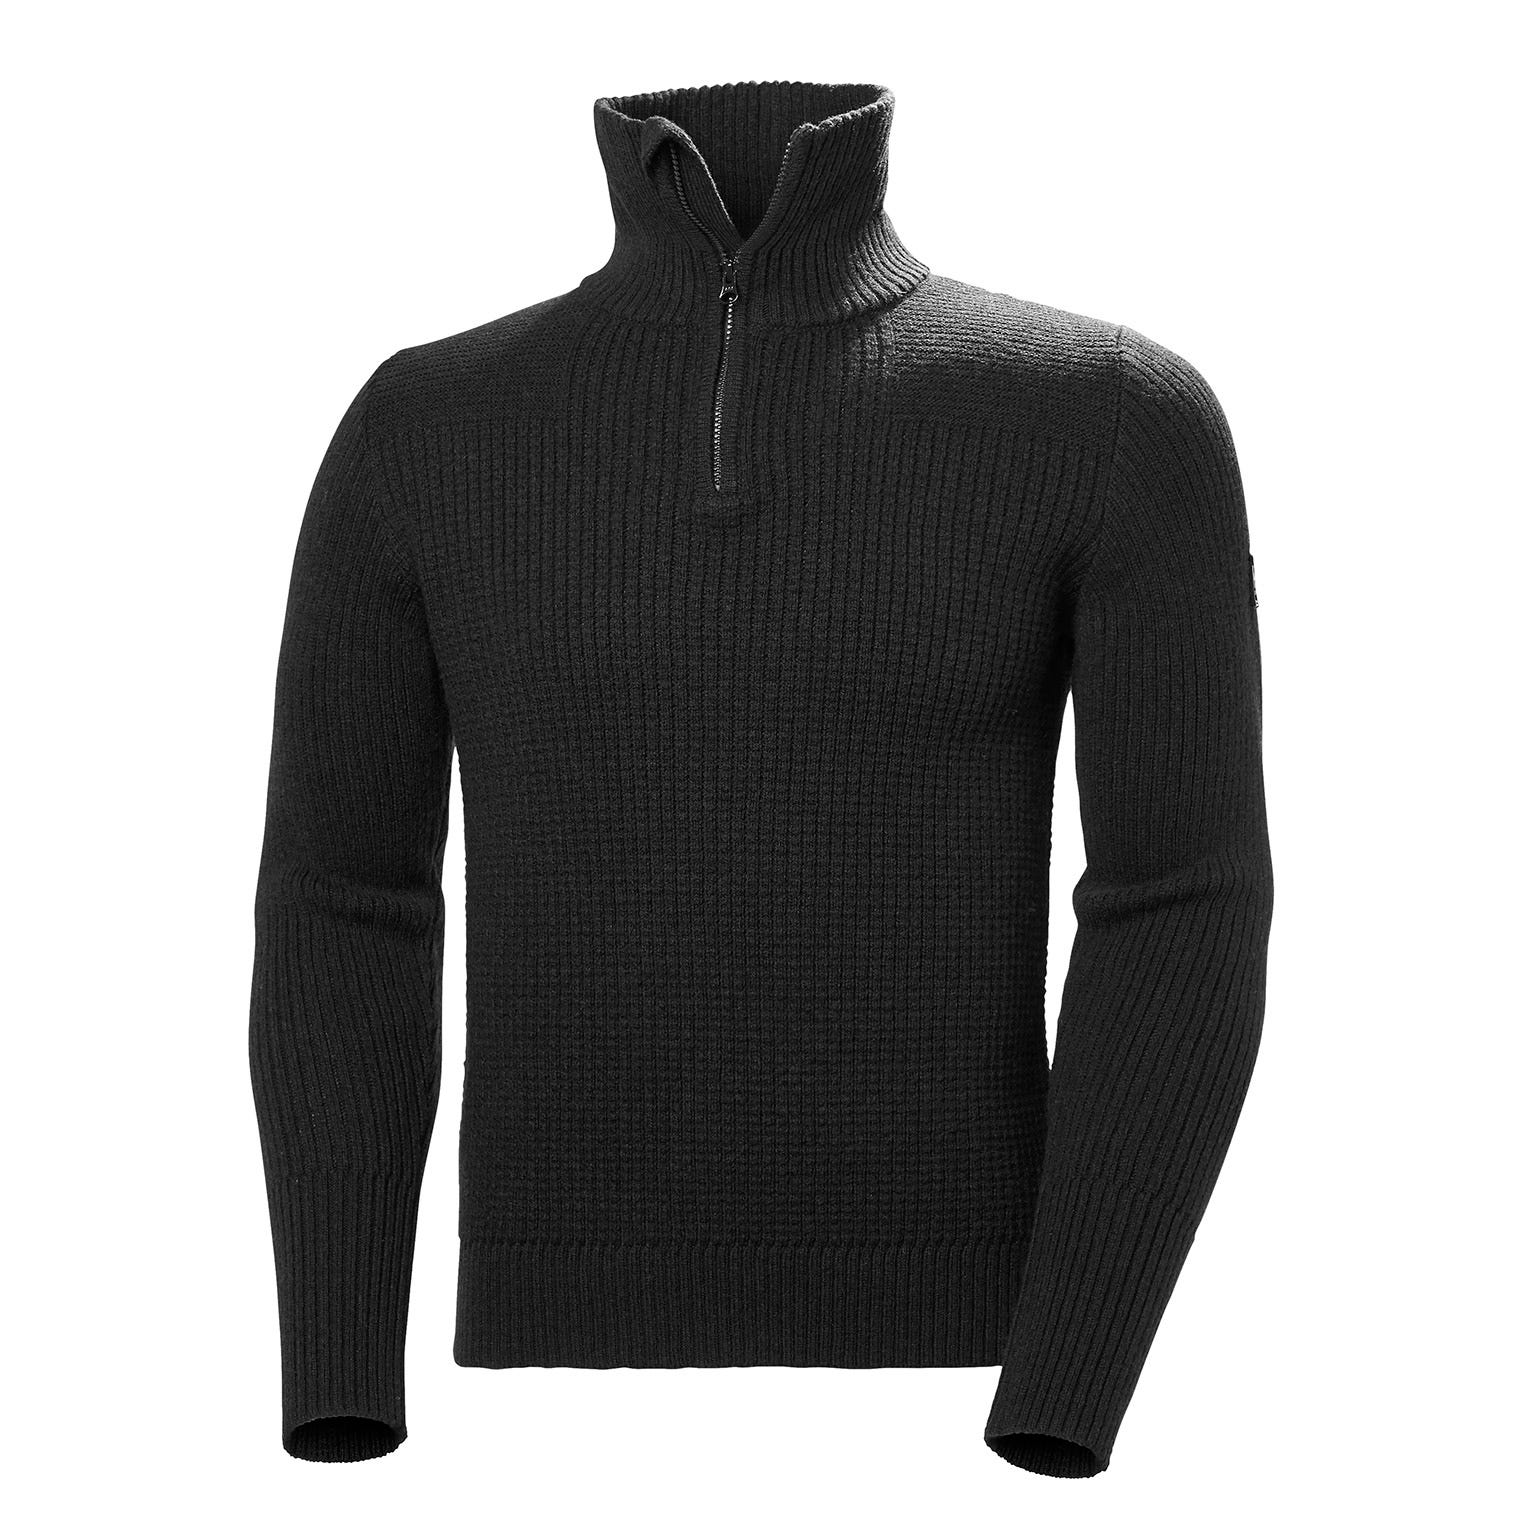 Marka Wool Sweater | Traditional Knitted Ski Gb Helly Hansen Mens Fleece Black M